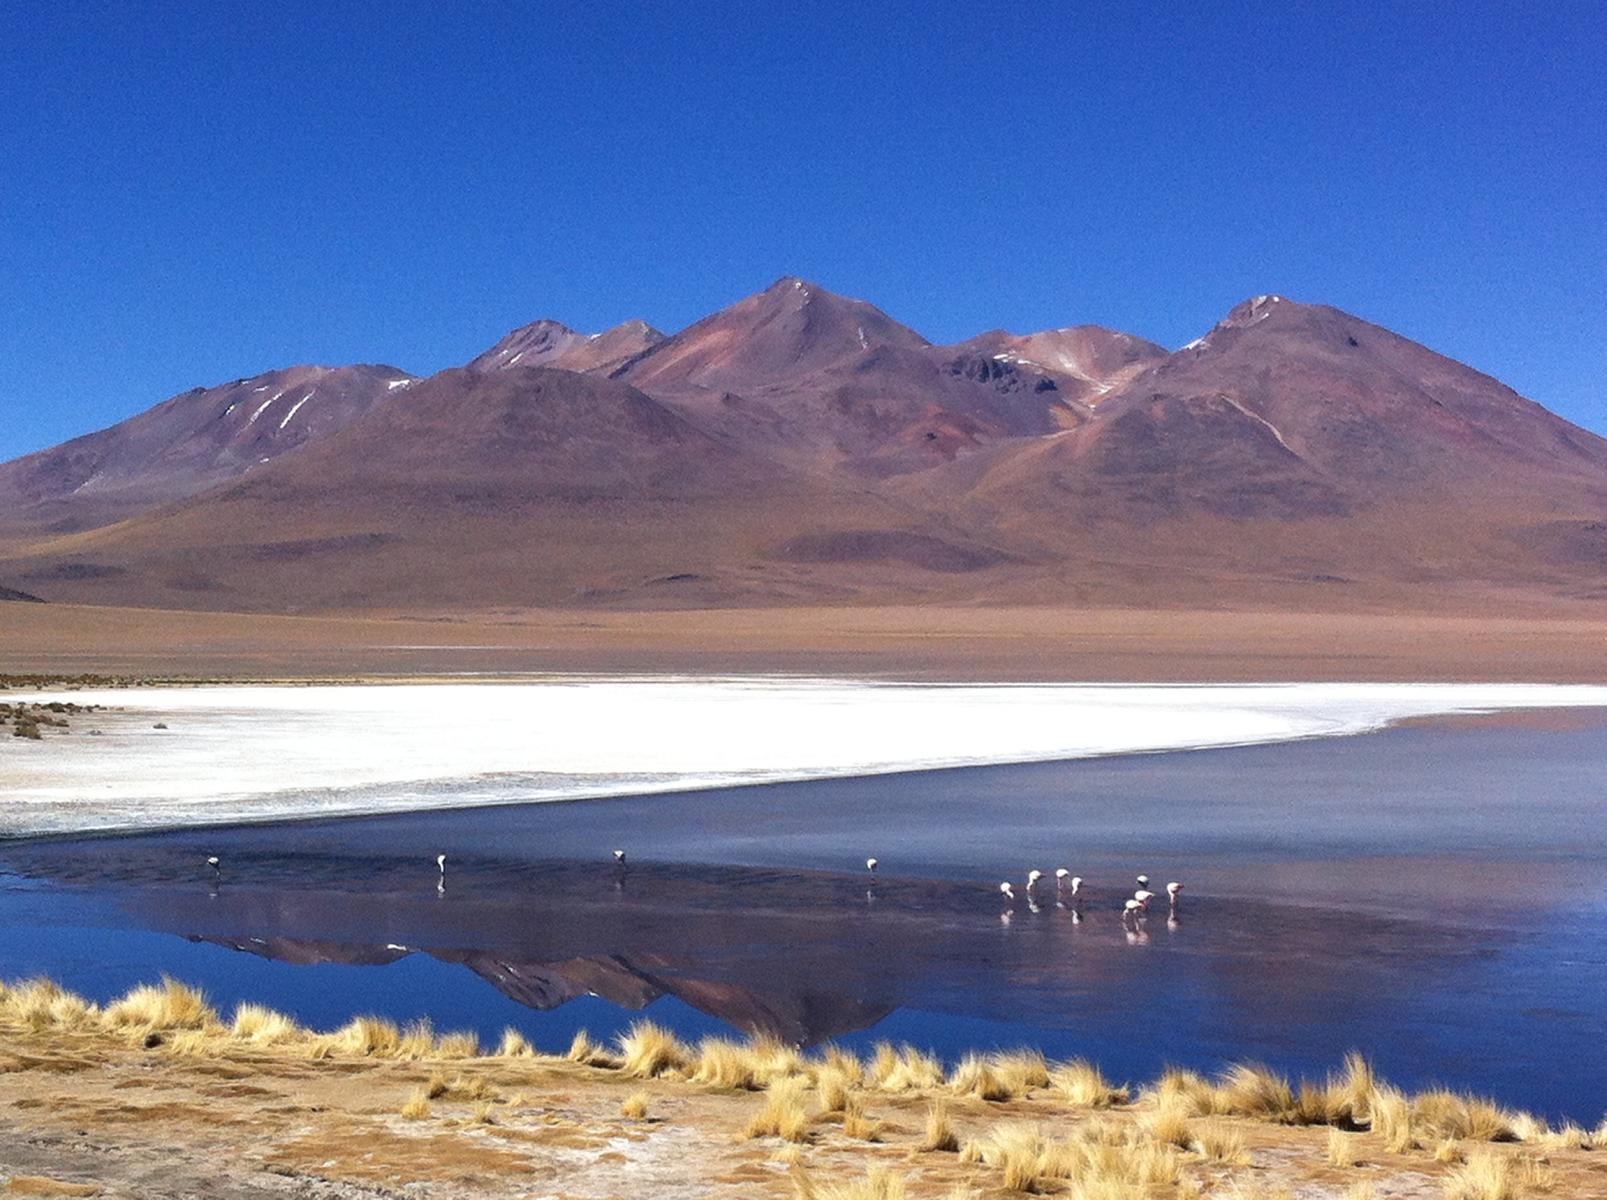 Voyage solidaire Bolivie : Vision du Monde - Photo 5